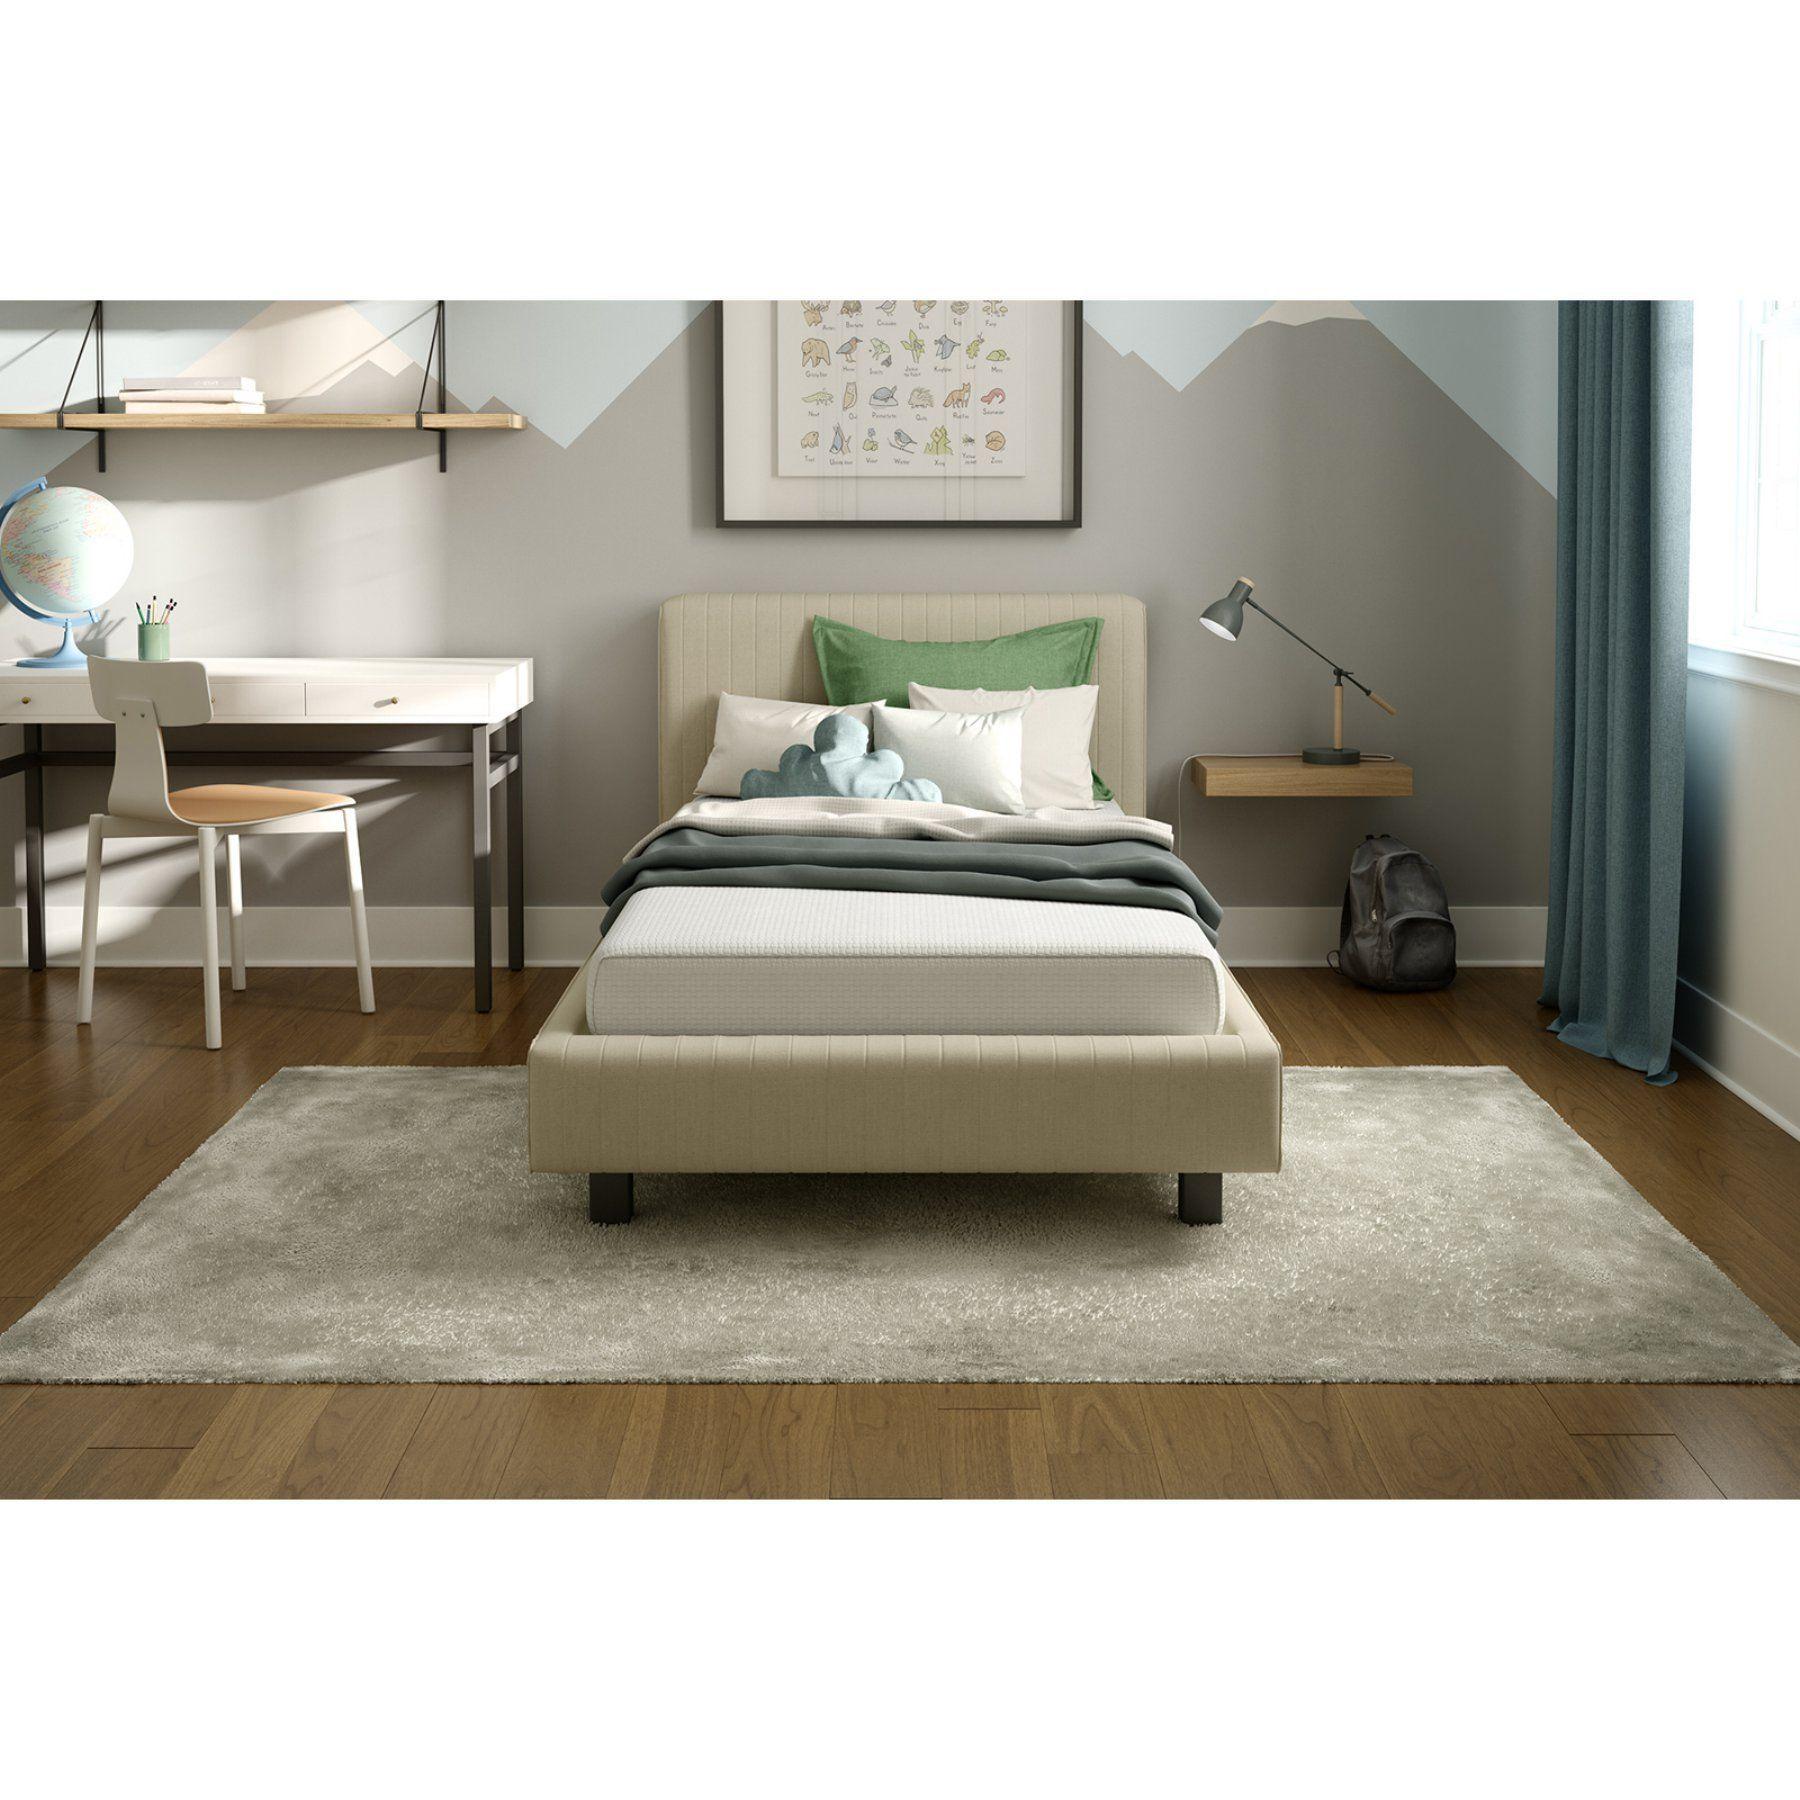 Signature Sleep Inspire 6 In Certipur Us Memory Foam Mattress